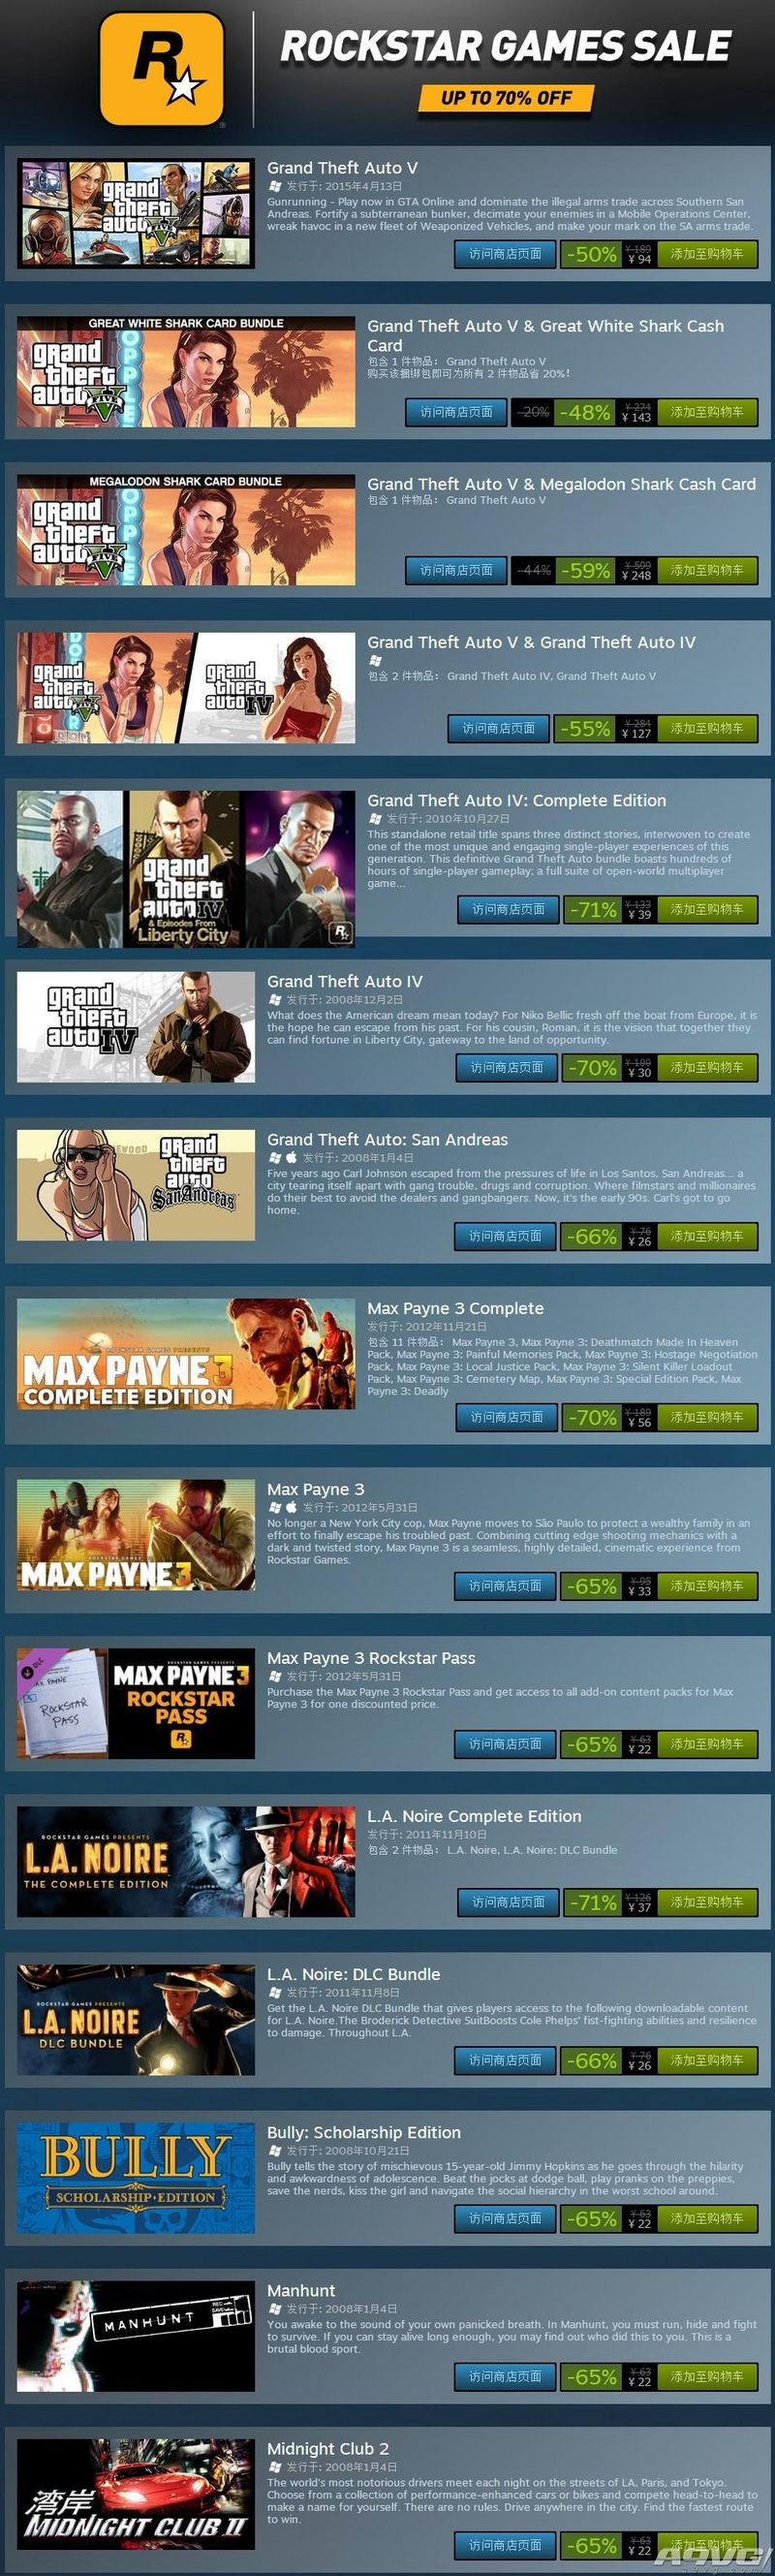 Steam迎R星游戏大优惠  《GTA5》《黑色洛城》大幅优惠